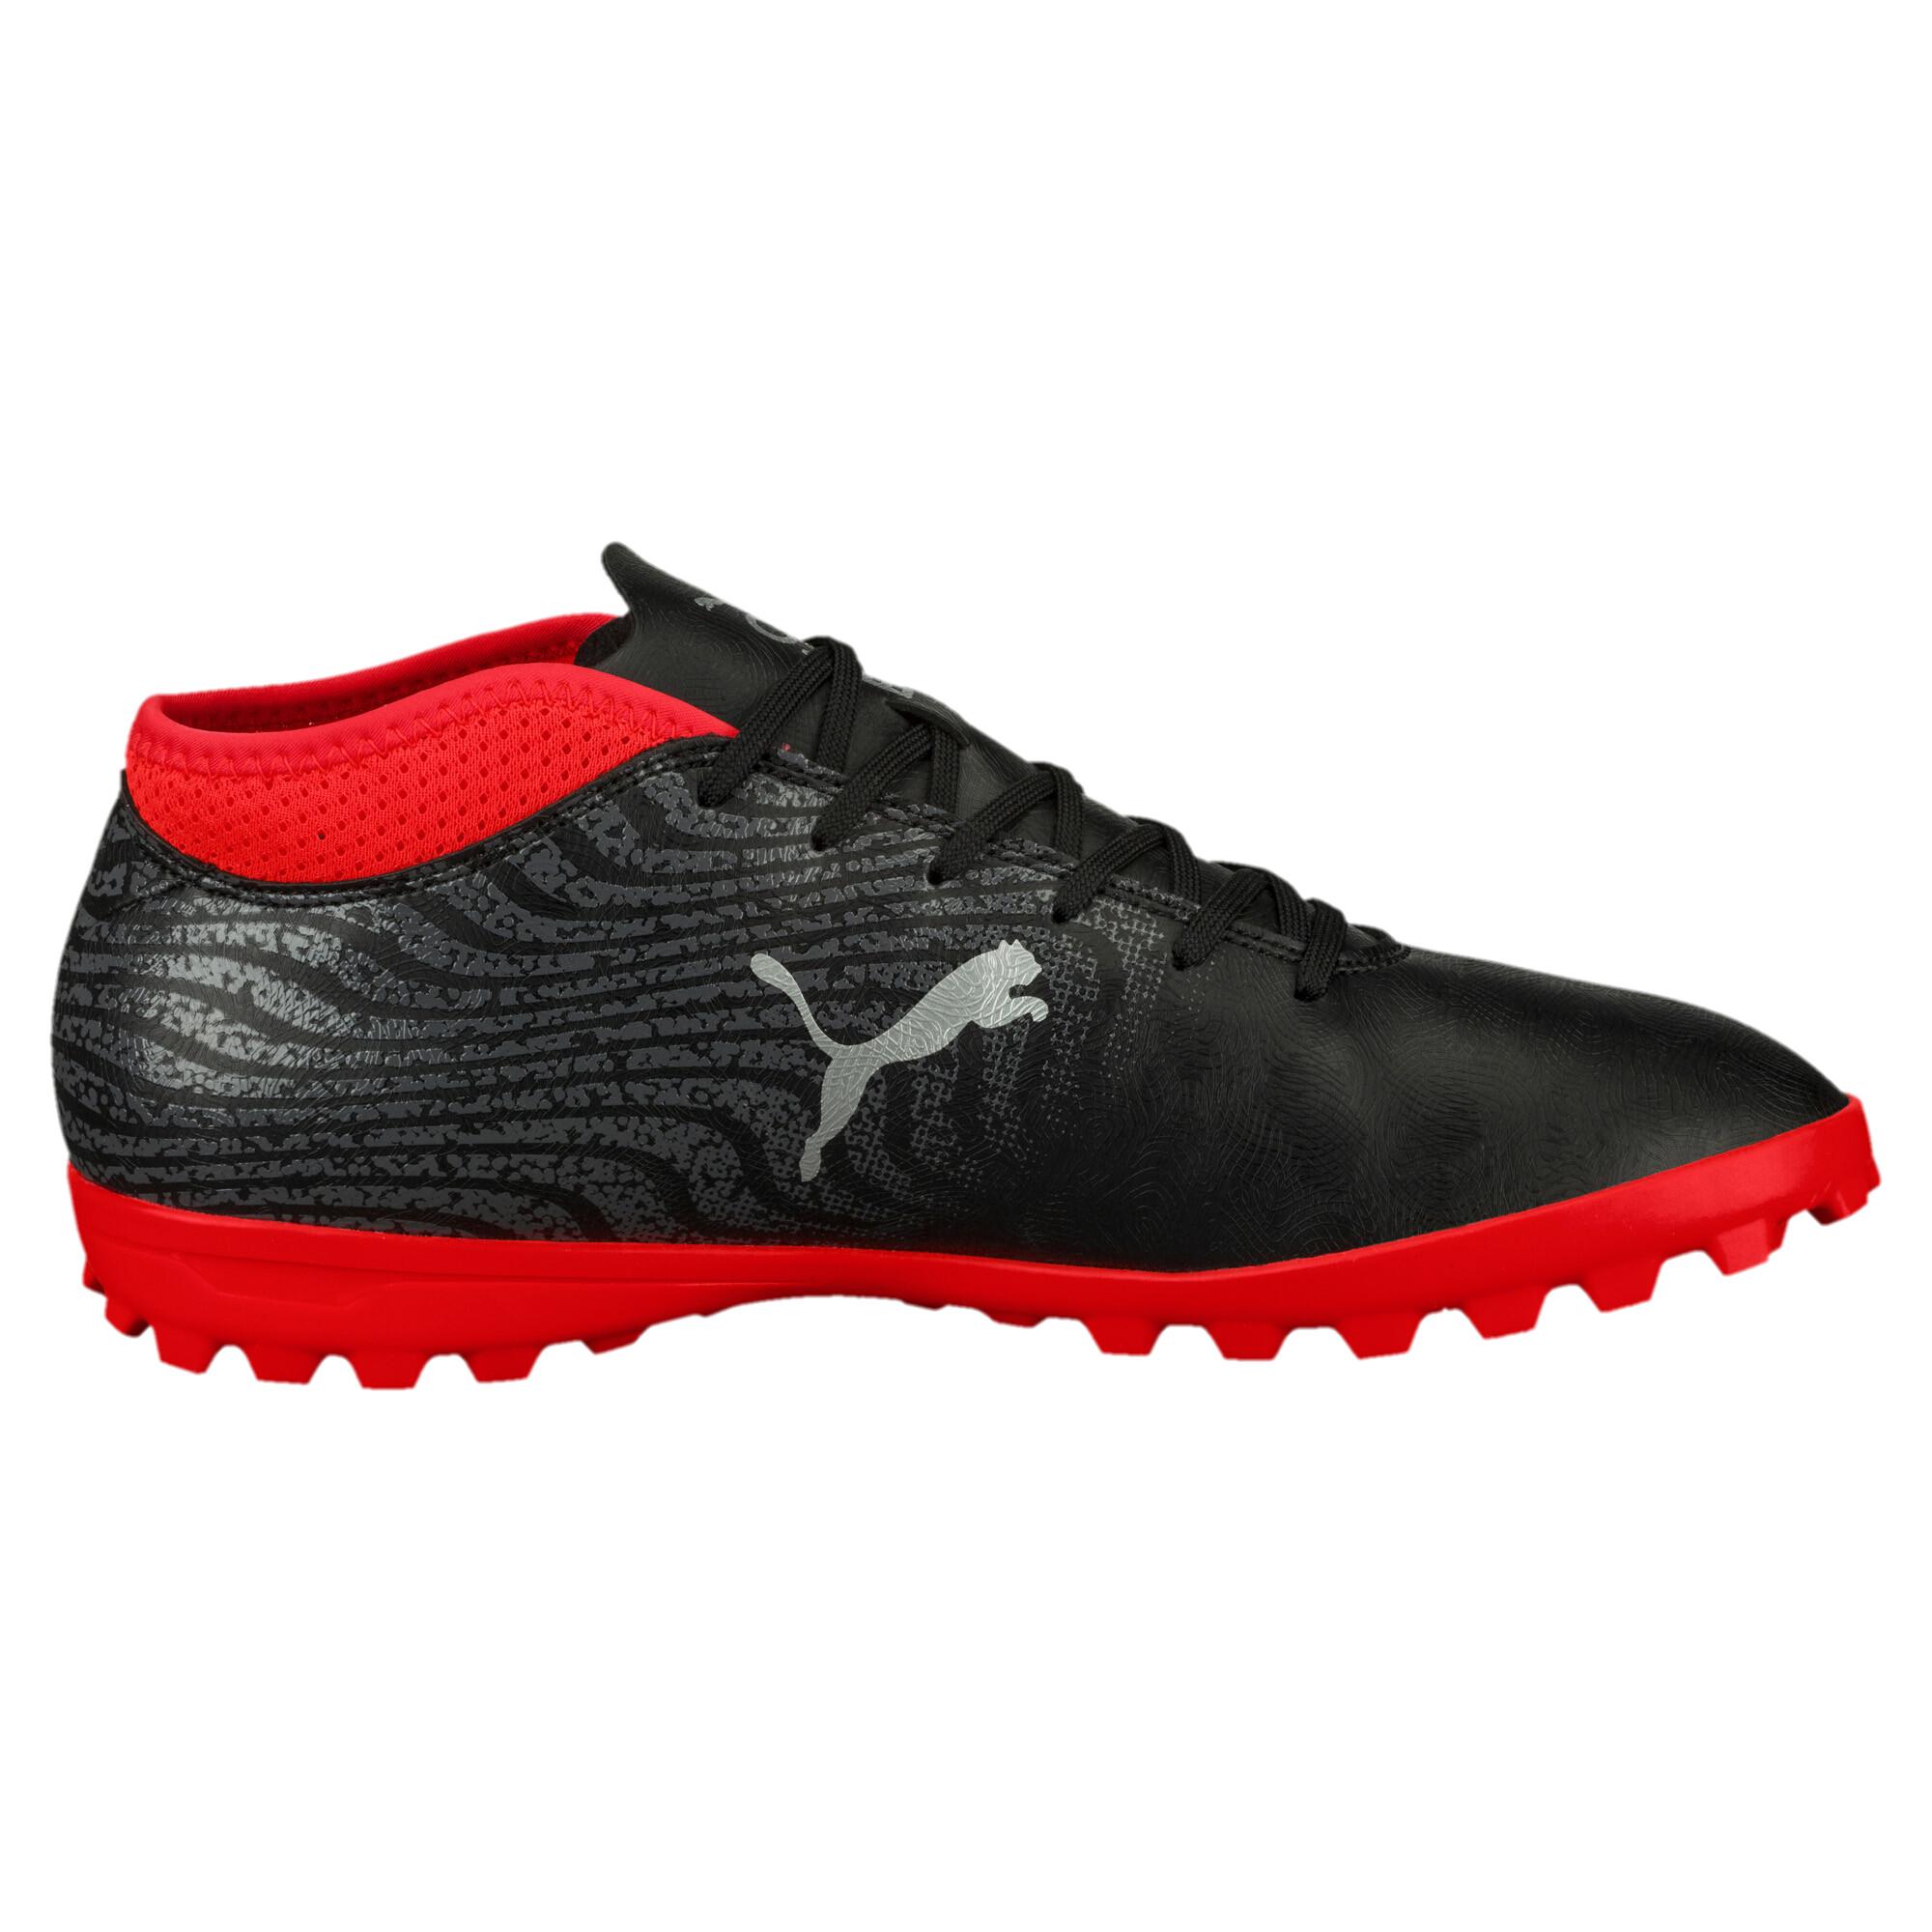 Image Puma Men's PUMA ONE 18.4 TT Football Boots #3